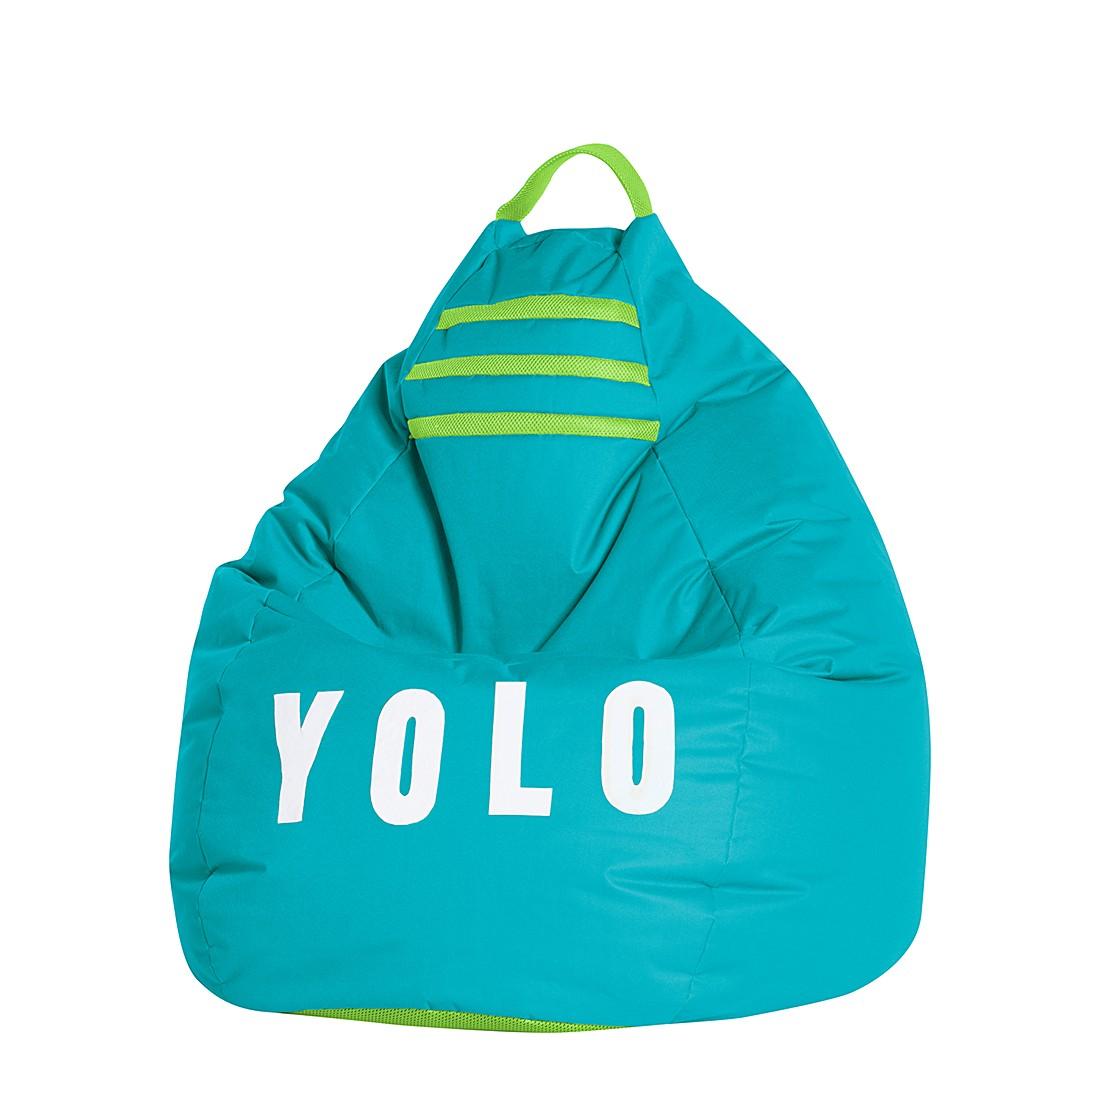 Sitzsack BeanBag Yolo XL – Grün, Fredriks günstig online kaufen